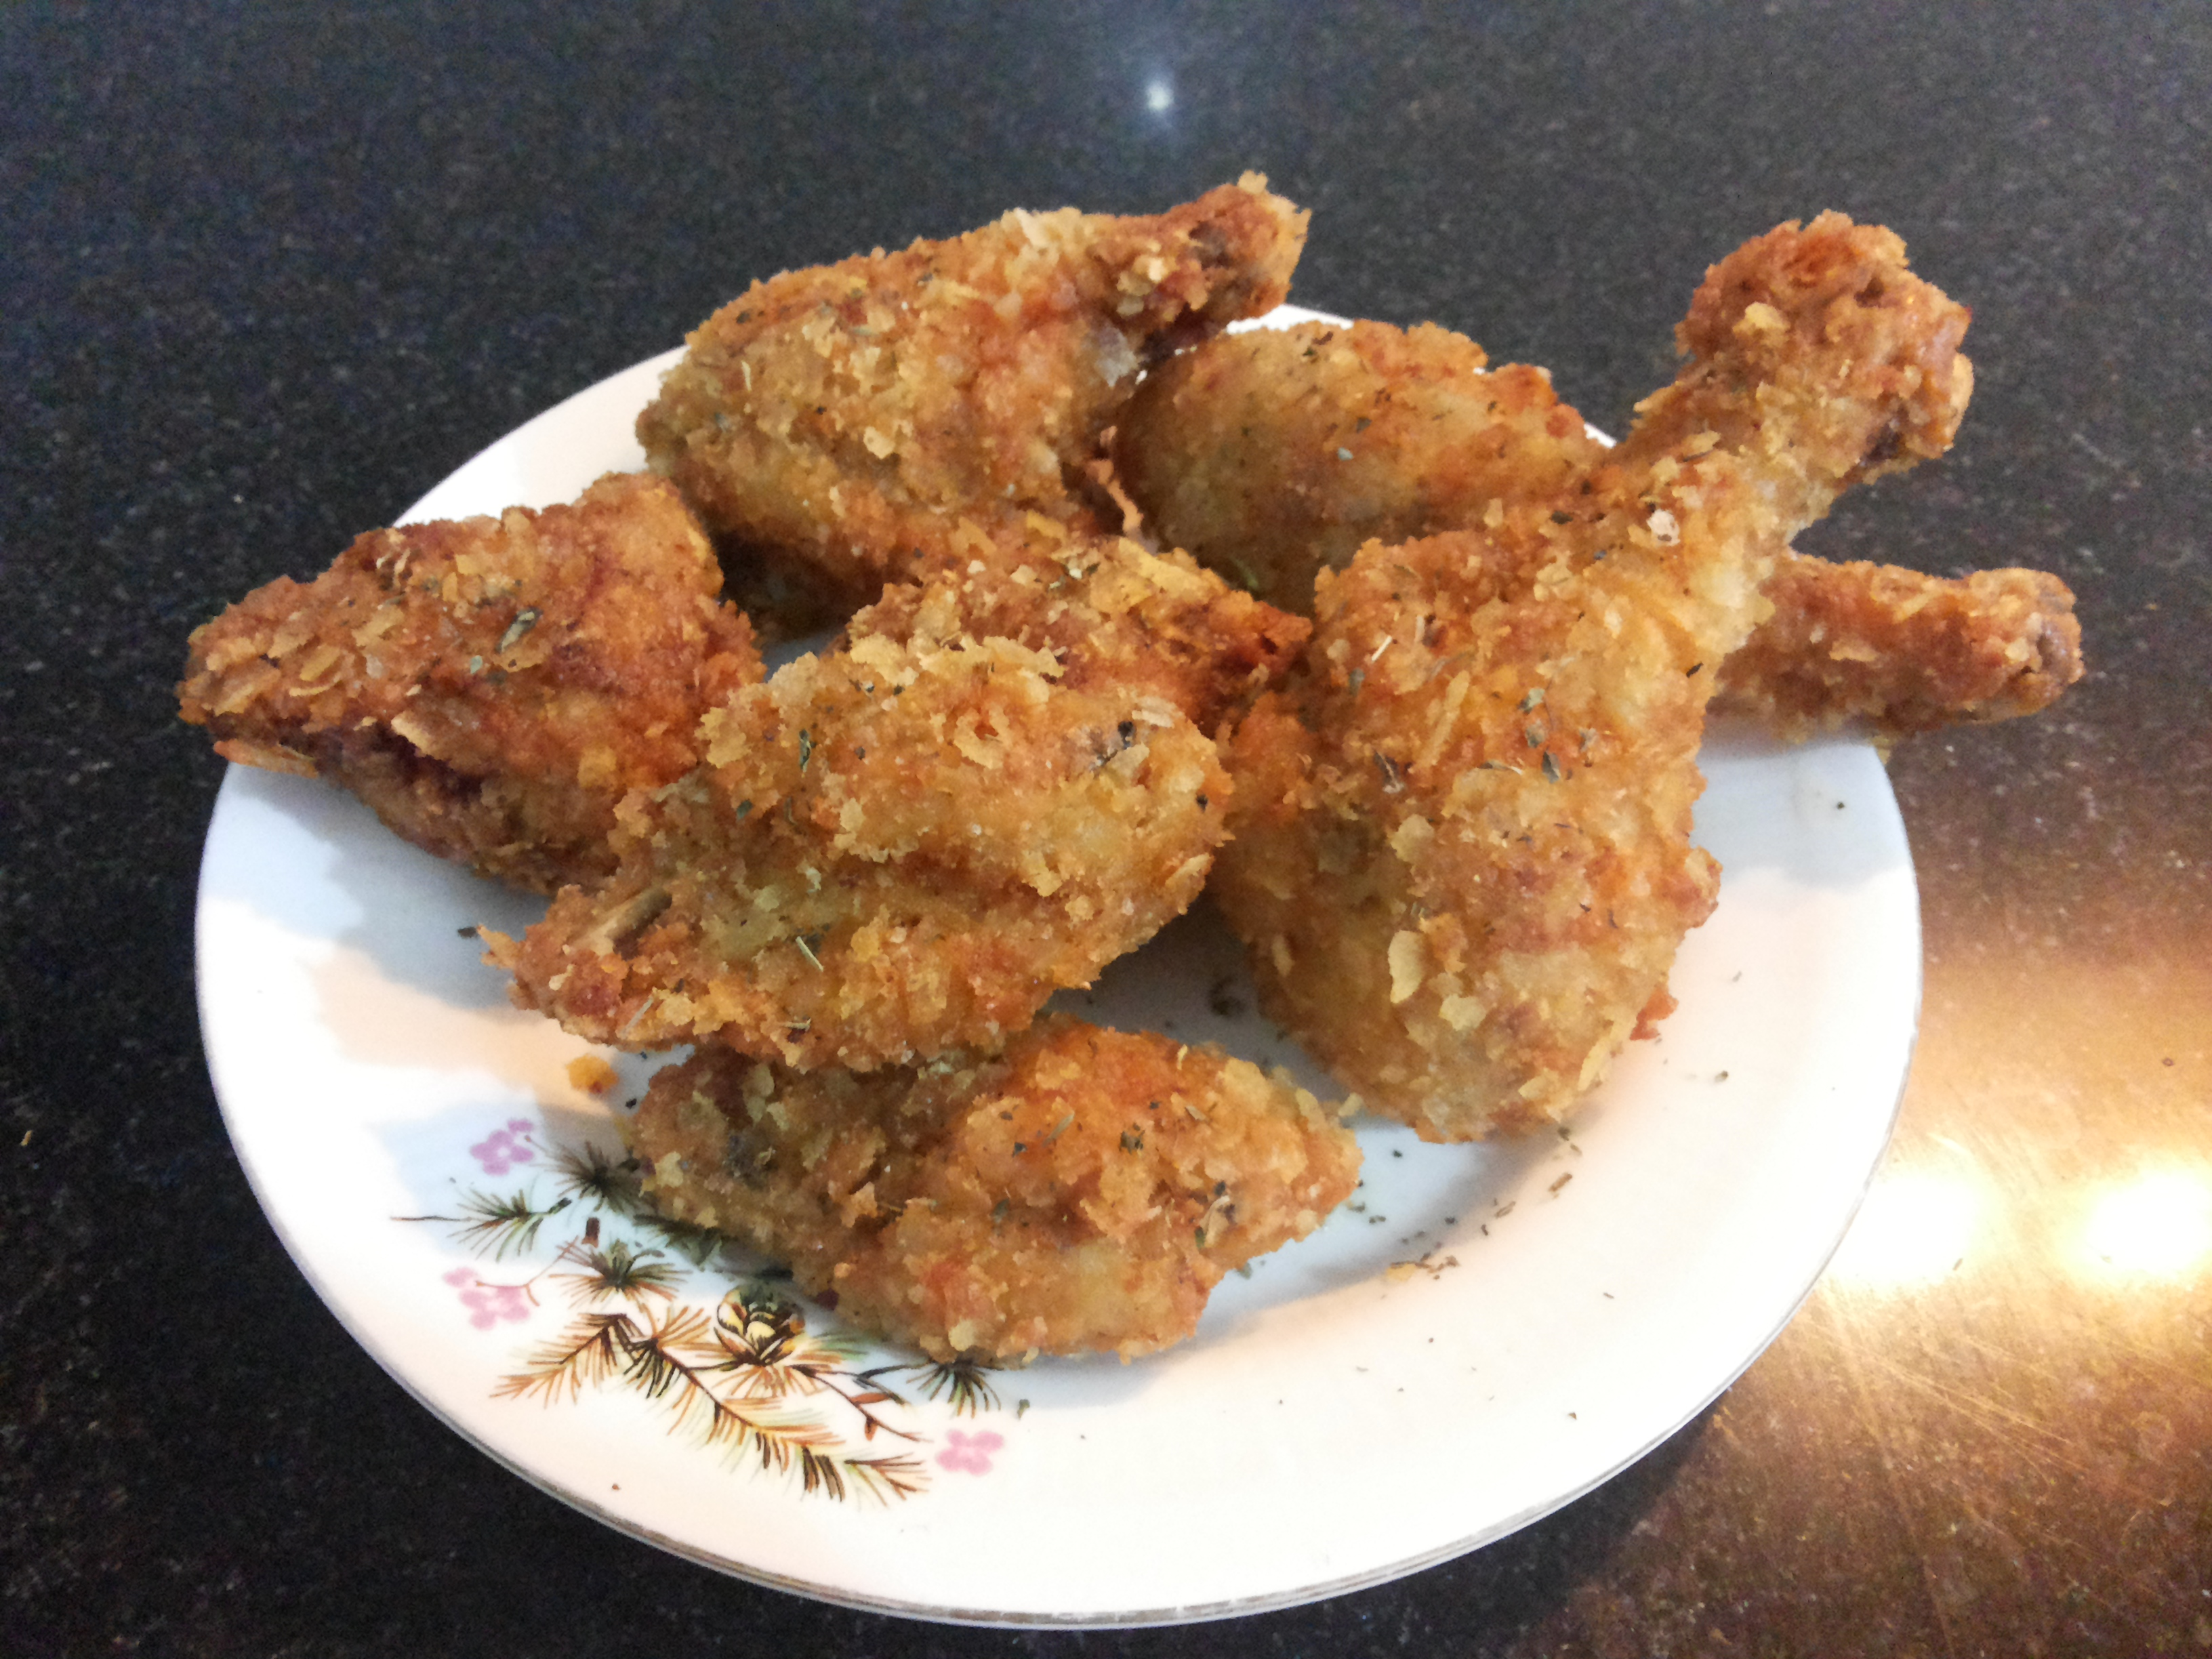 Picture of KFC Hot & Crisp Copycat